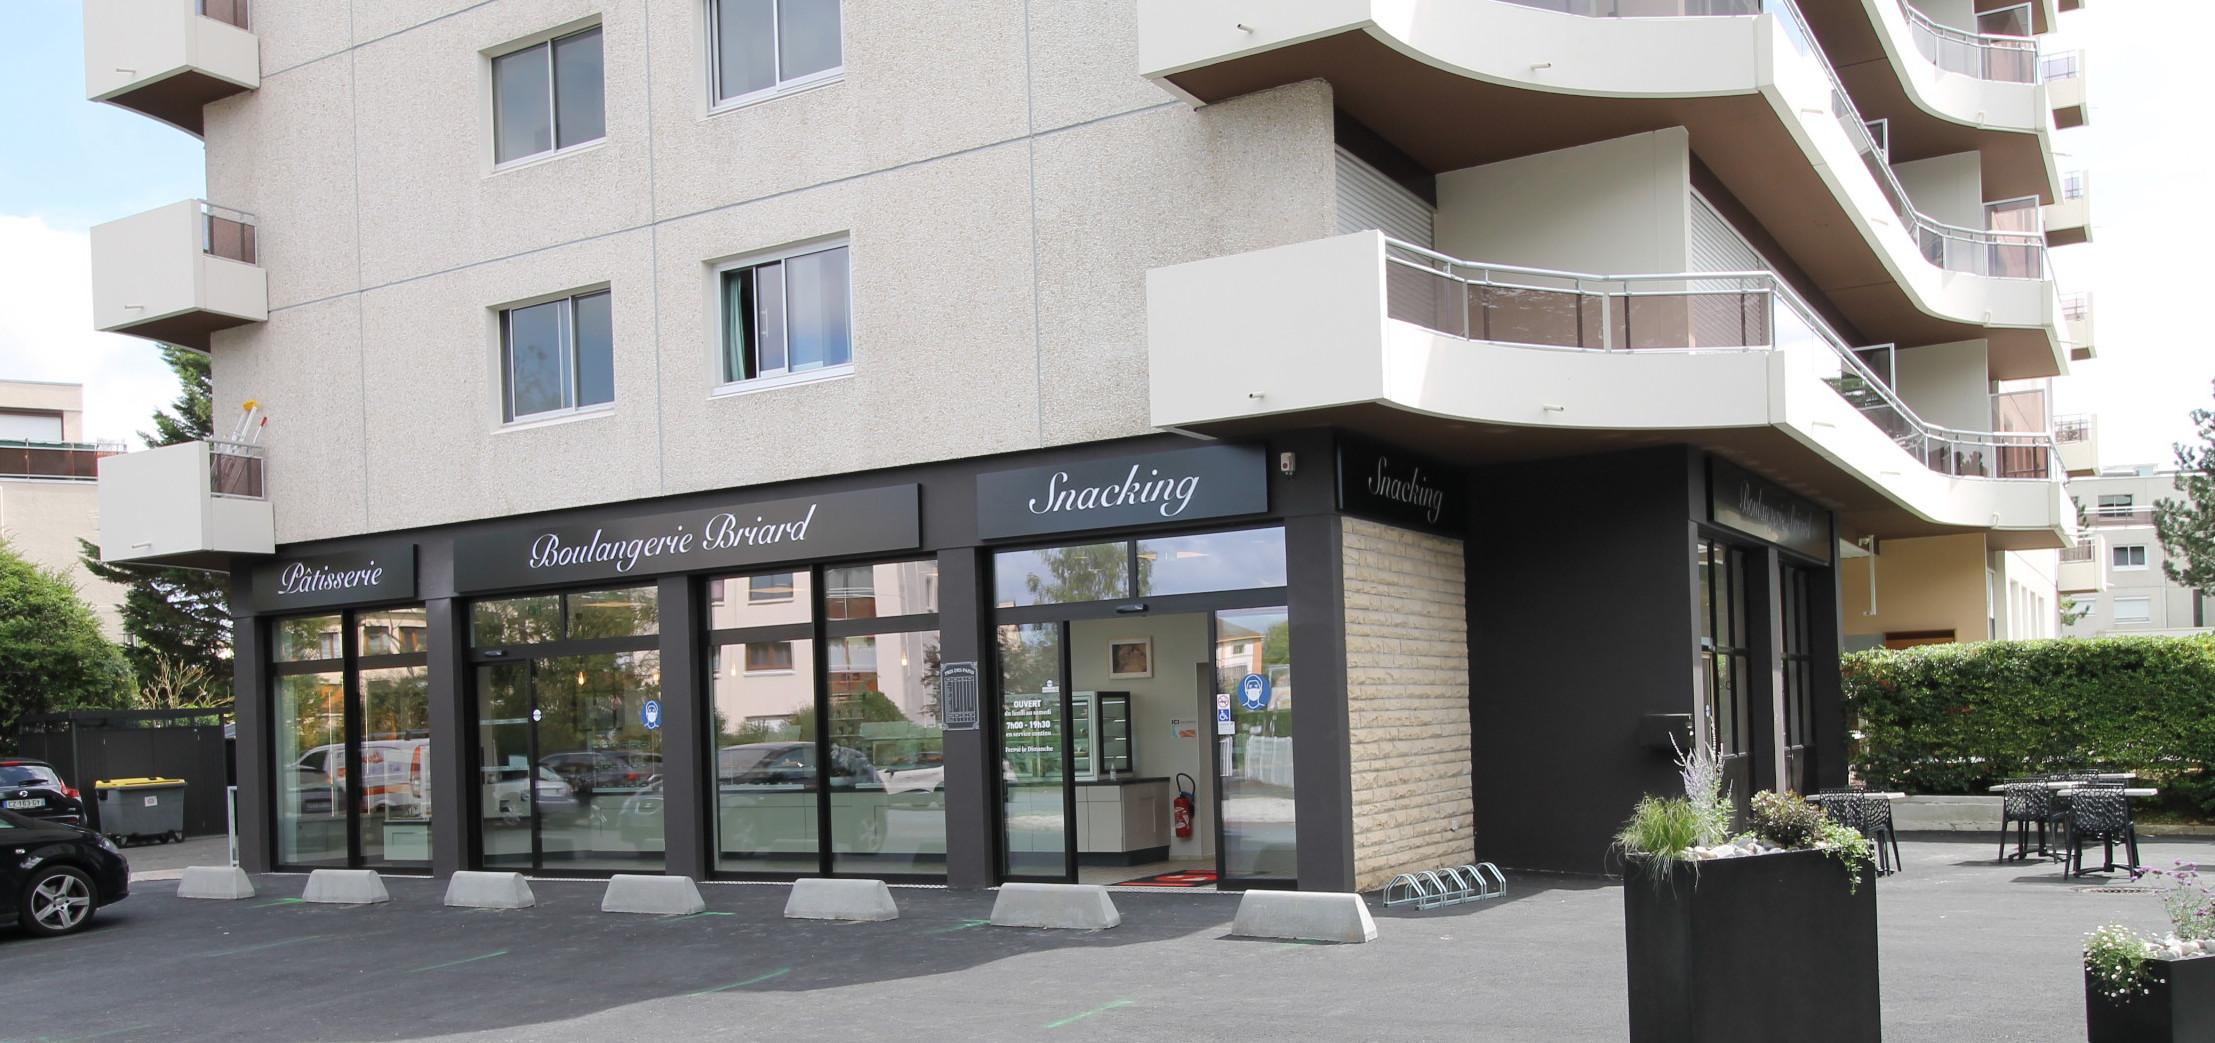 dimitri-danger-boulangerie-caen-briard-05